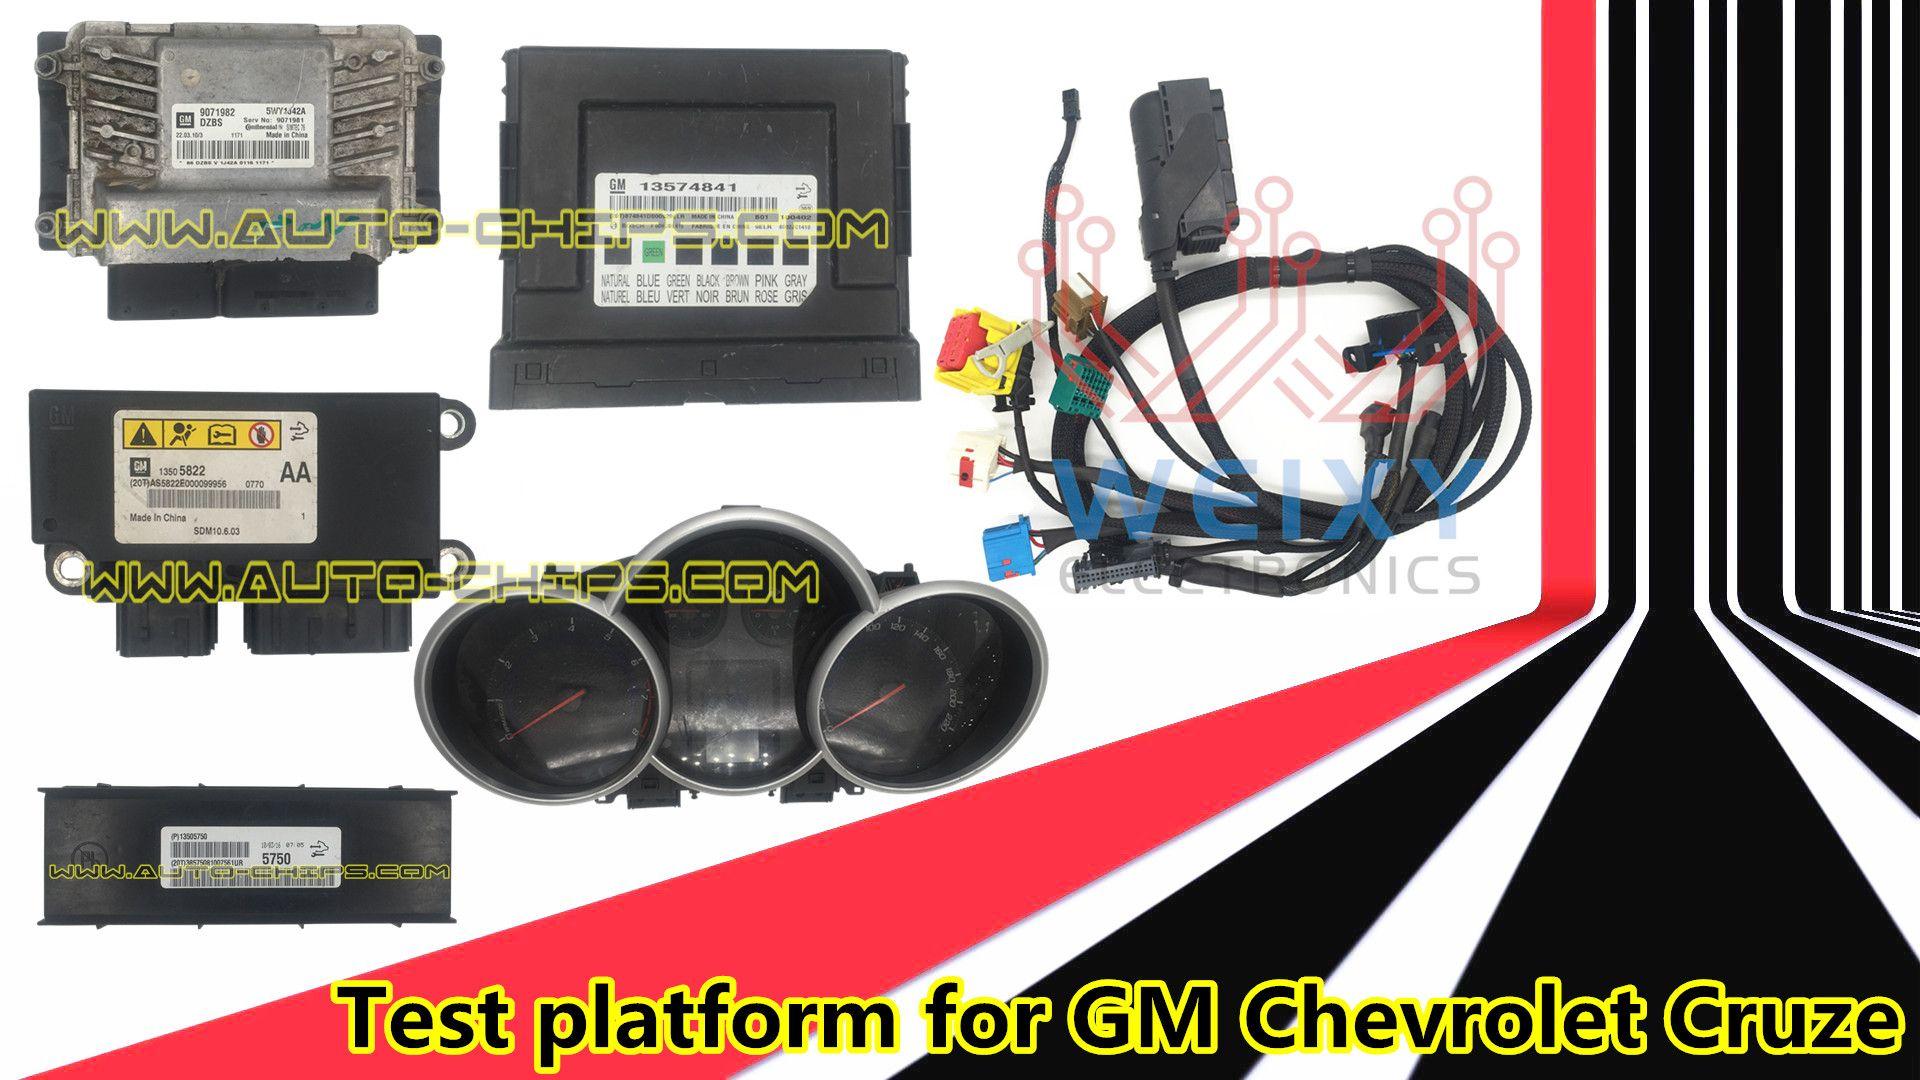 gm chevrolet cruze test platform enable programing keys on the bench restore airbag ecm [ 1920 x 1080 Pixel ]